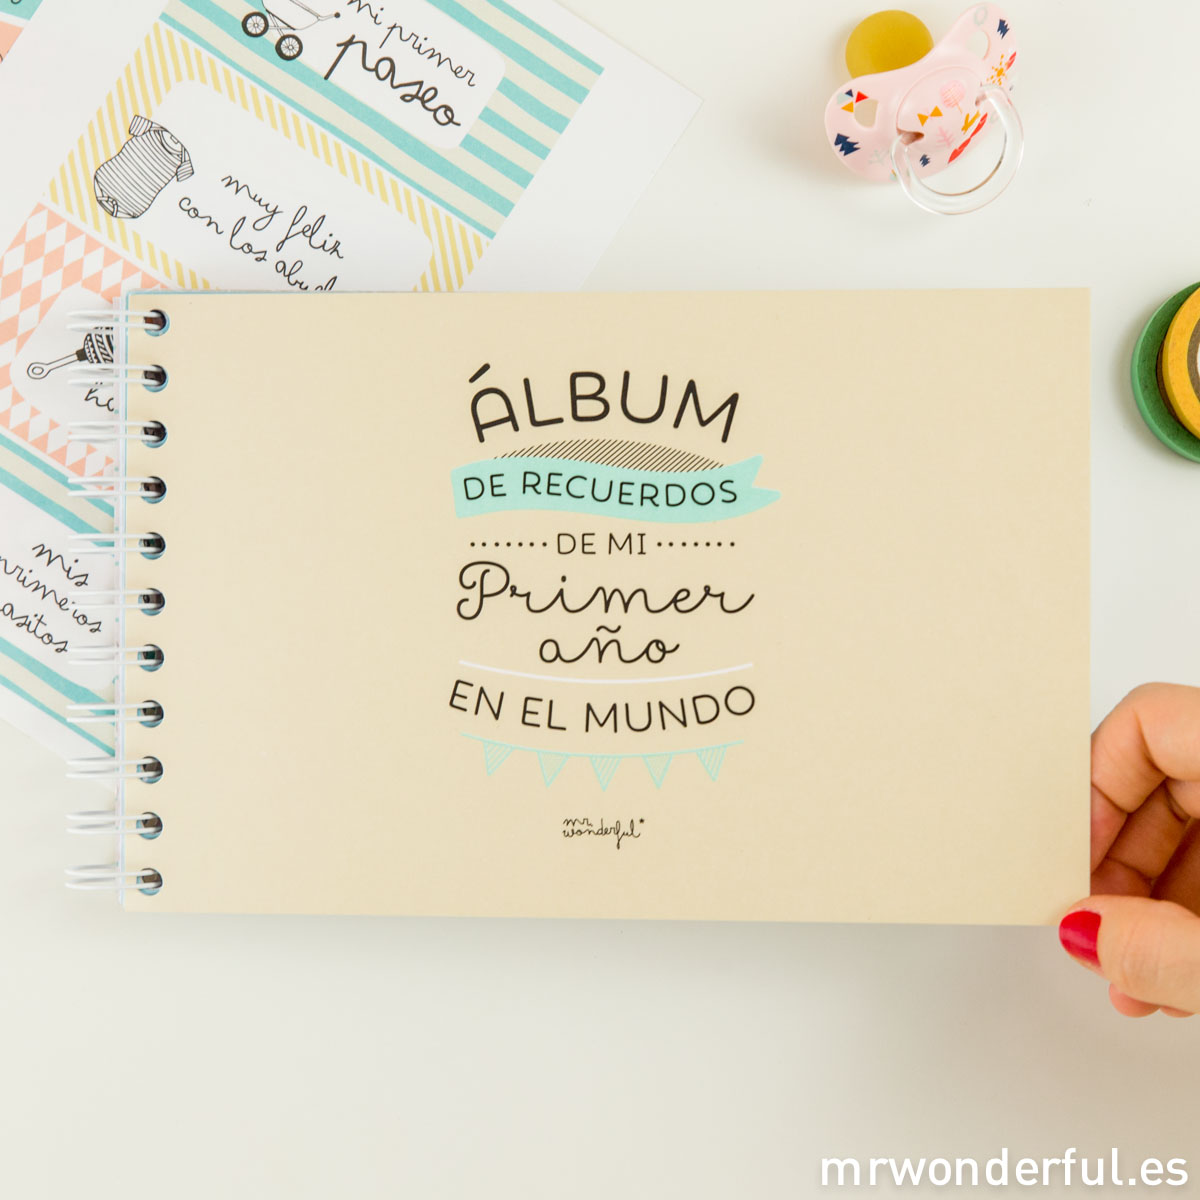 mrwonderful_album-bebe_01_album-1-aniversario-bebe-80-Editar